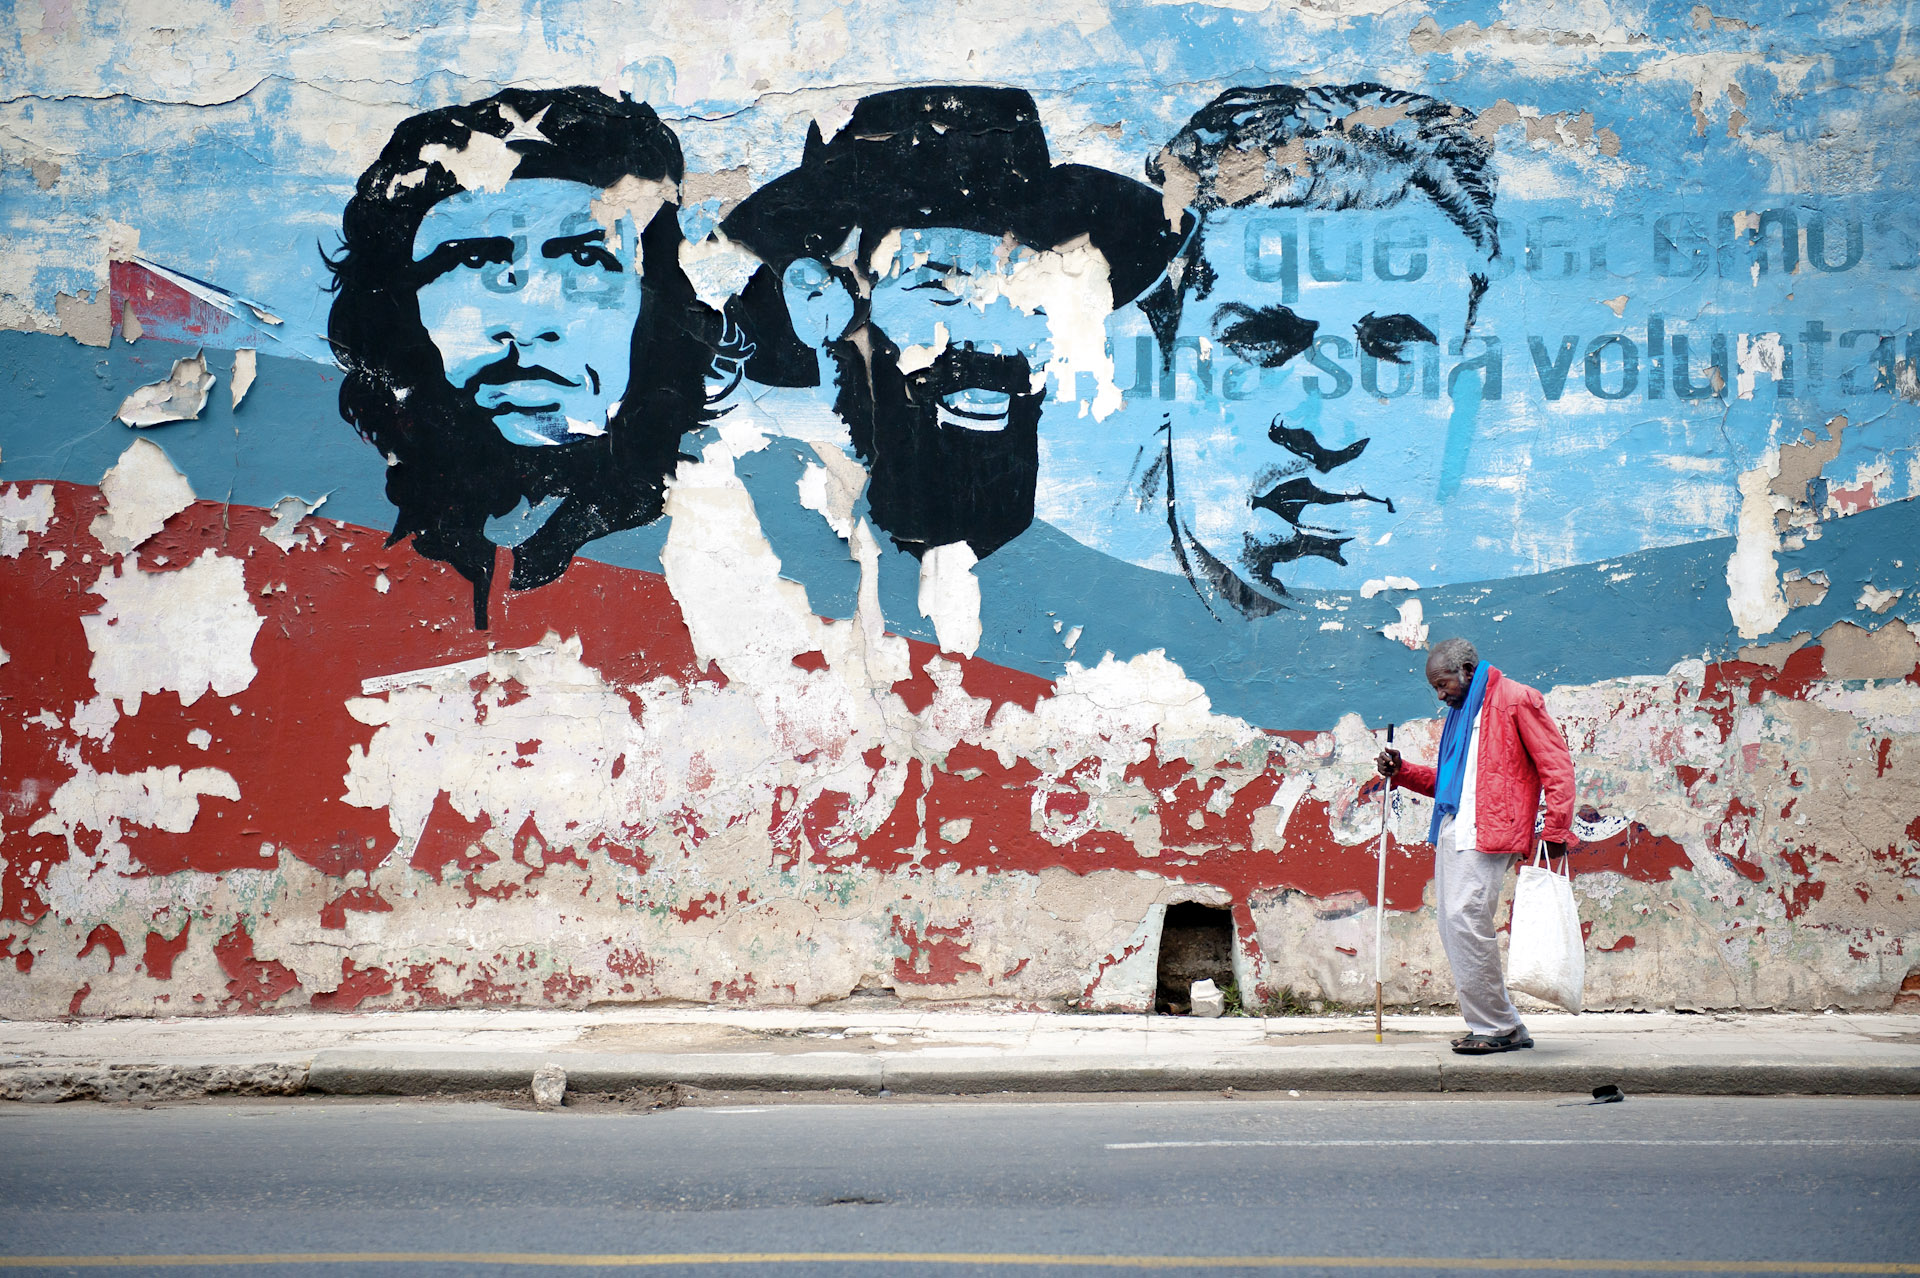 Cuba-Havana-Travel-Old-Man-Revolution-Che-Mural-Jason-Bax.JPG